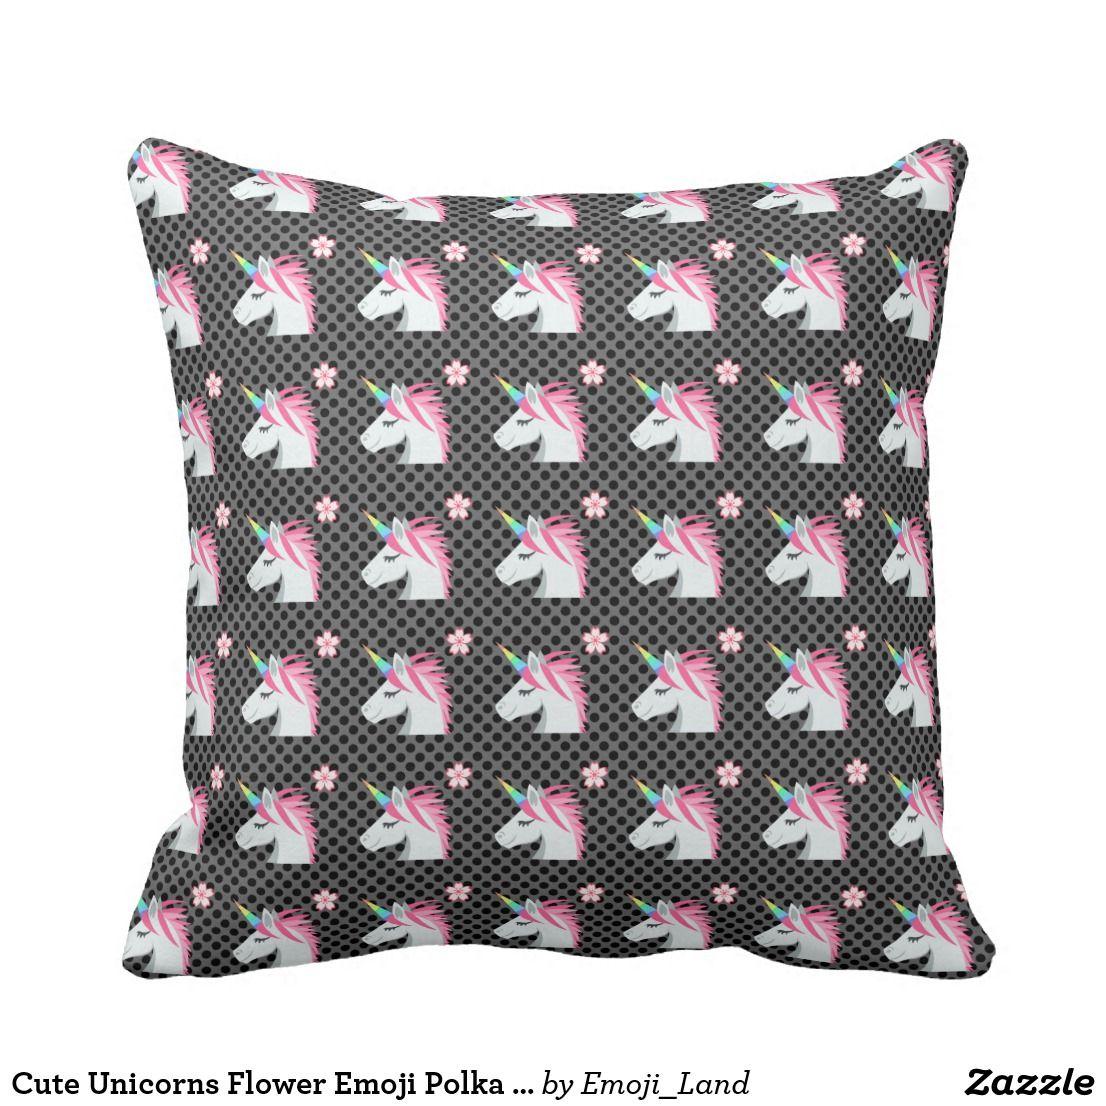 Cute Unicorns Flower Emoji Polka Dots Pattern Throw Pillow